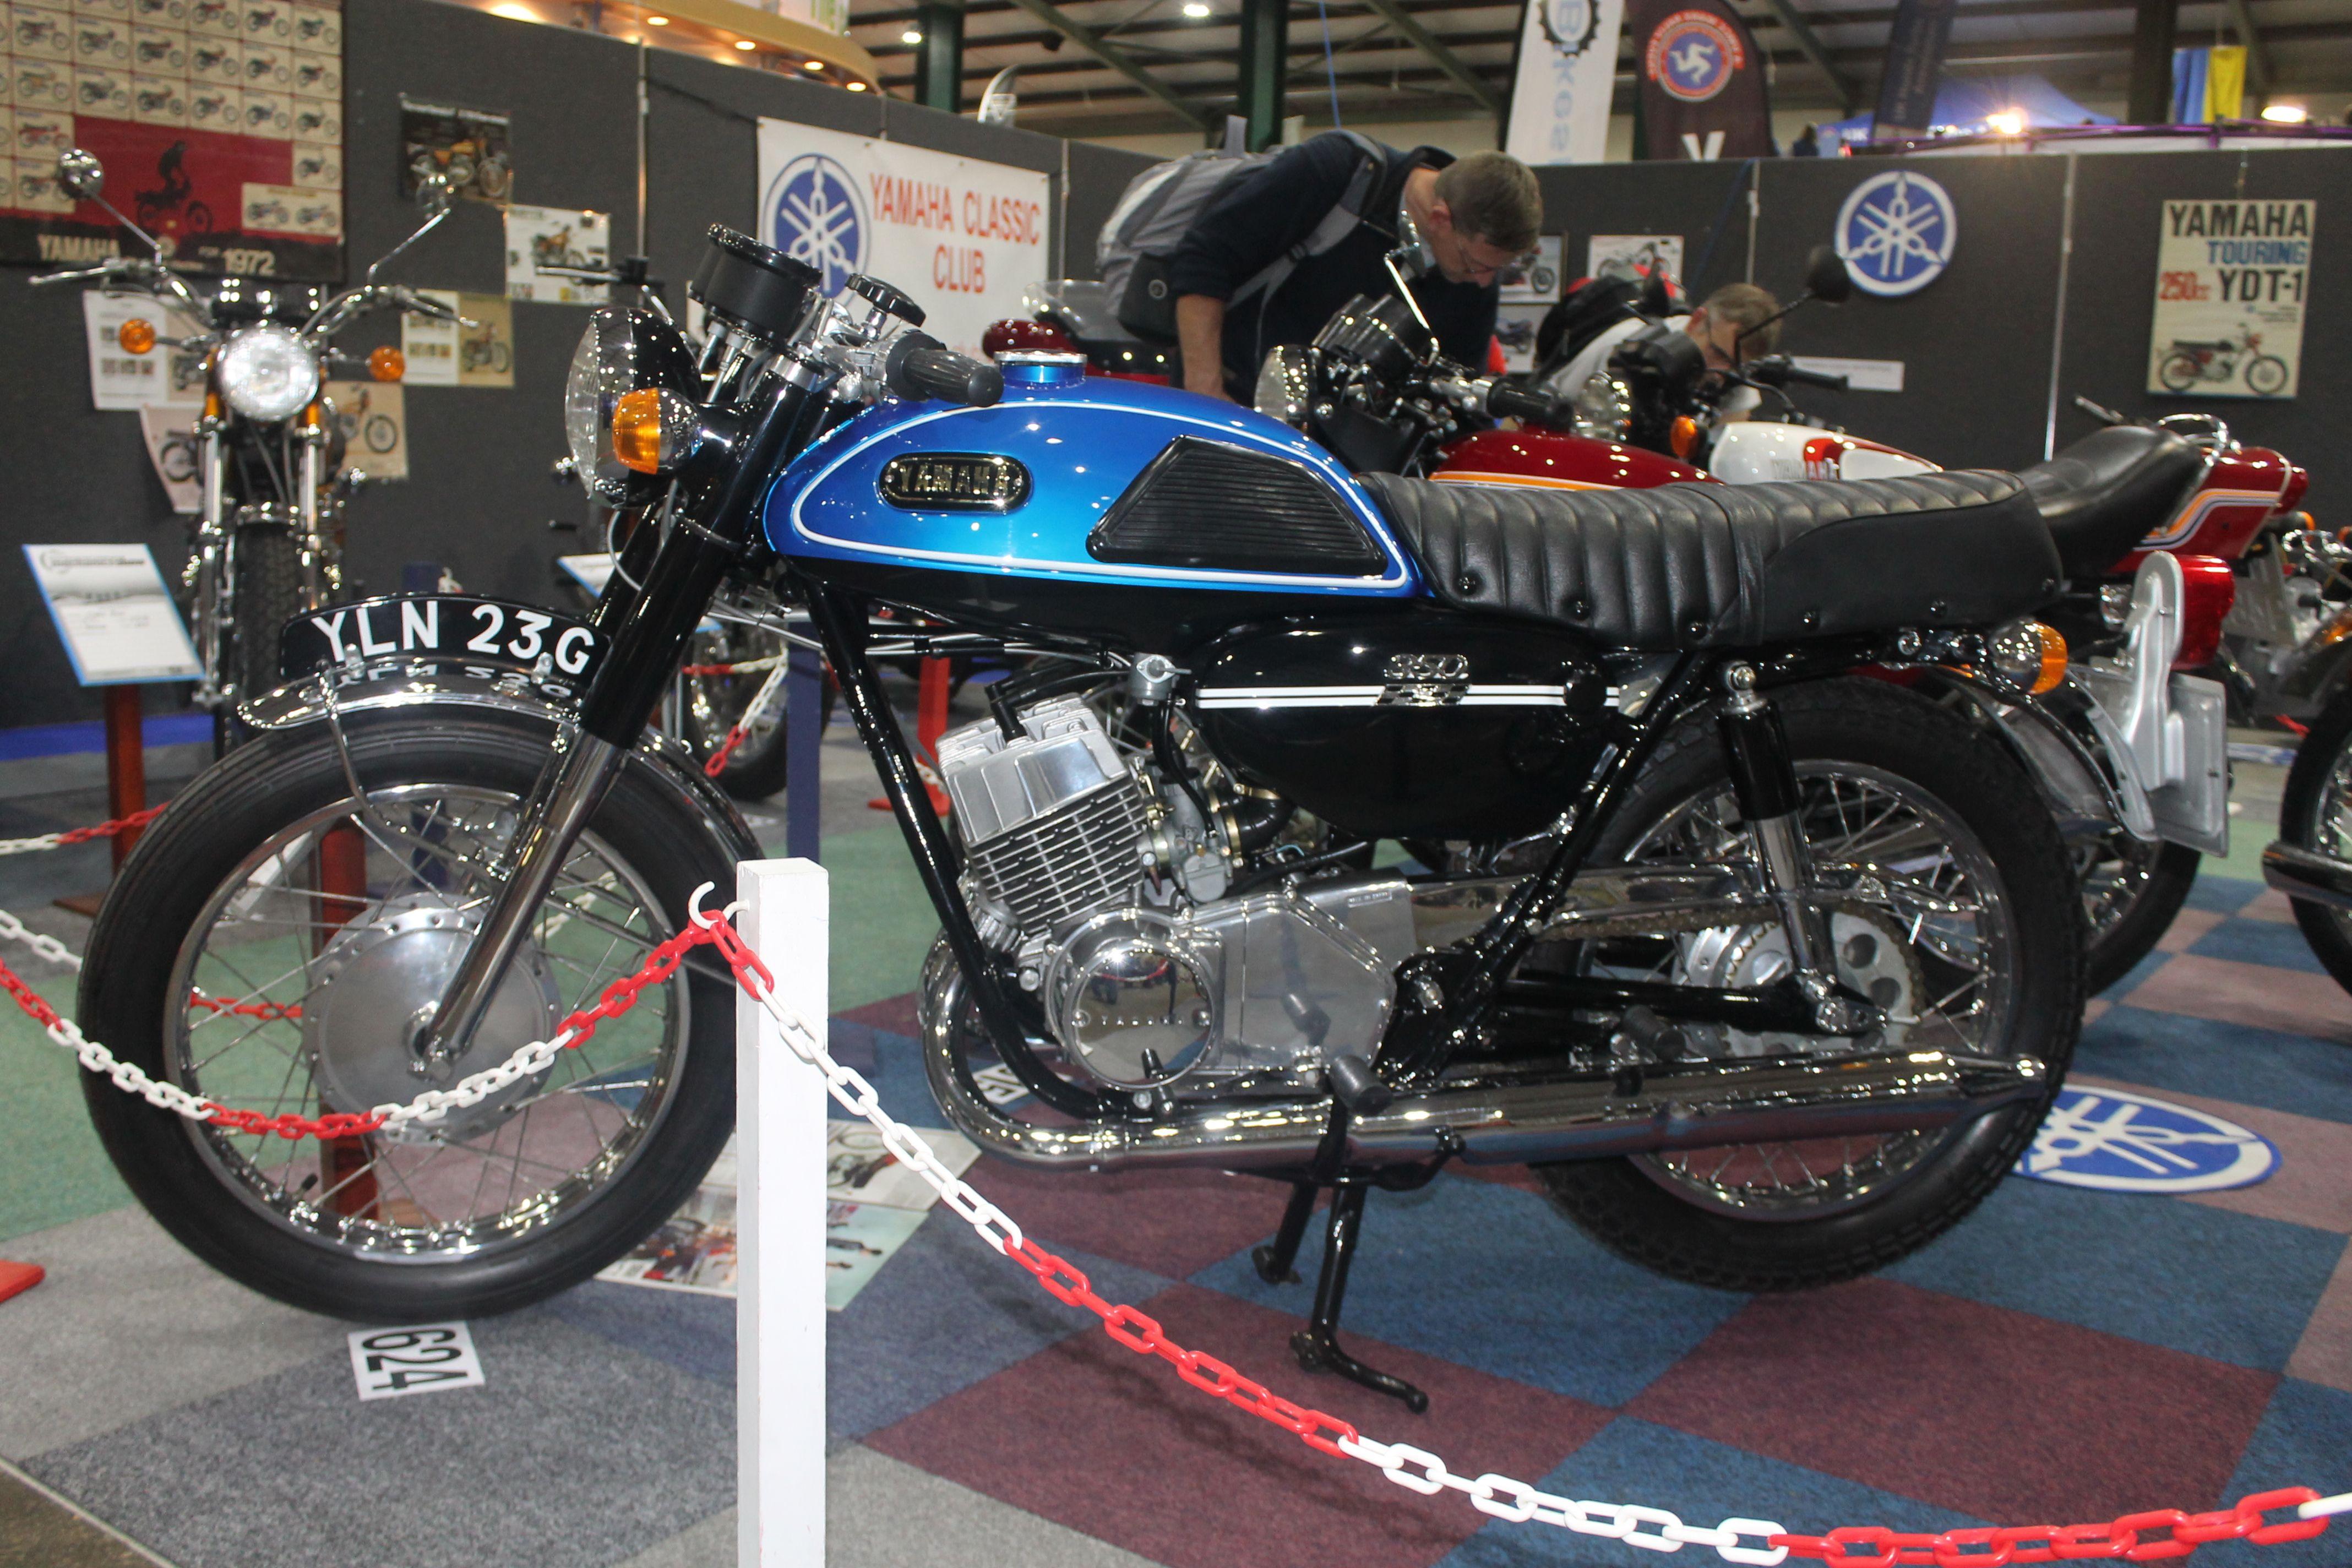 1969 Yamaha Yr3 350cc Yamaha Classic Motorcycles Valentino Rossi 46